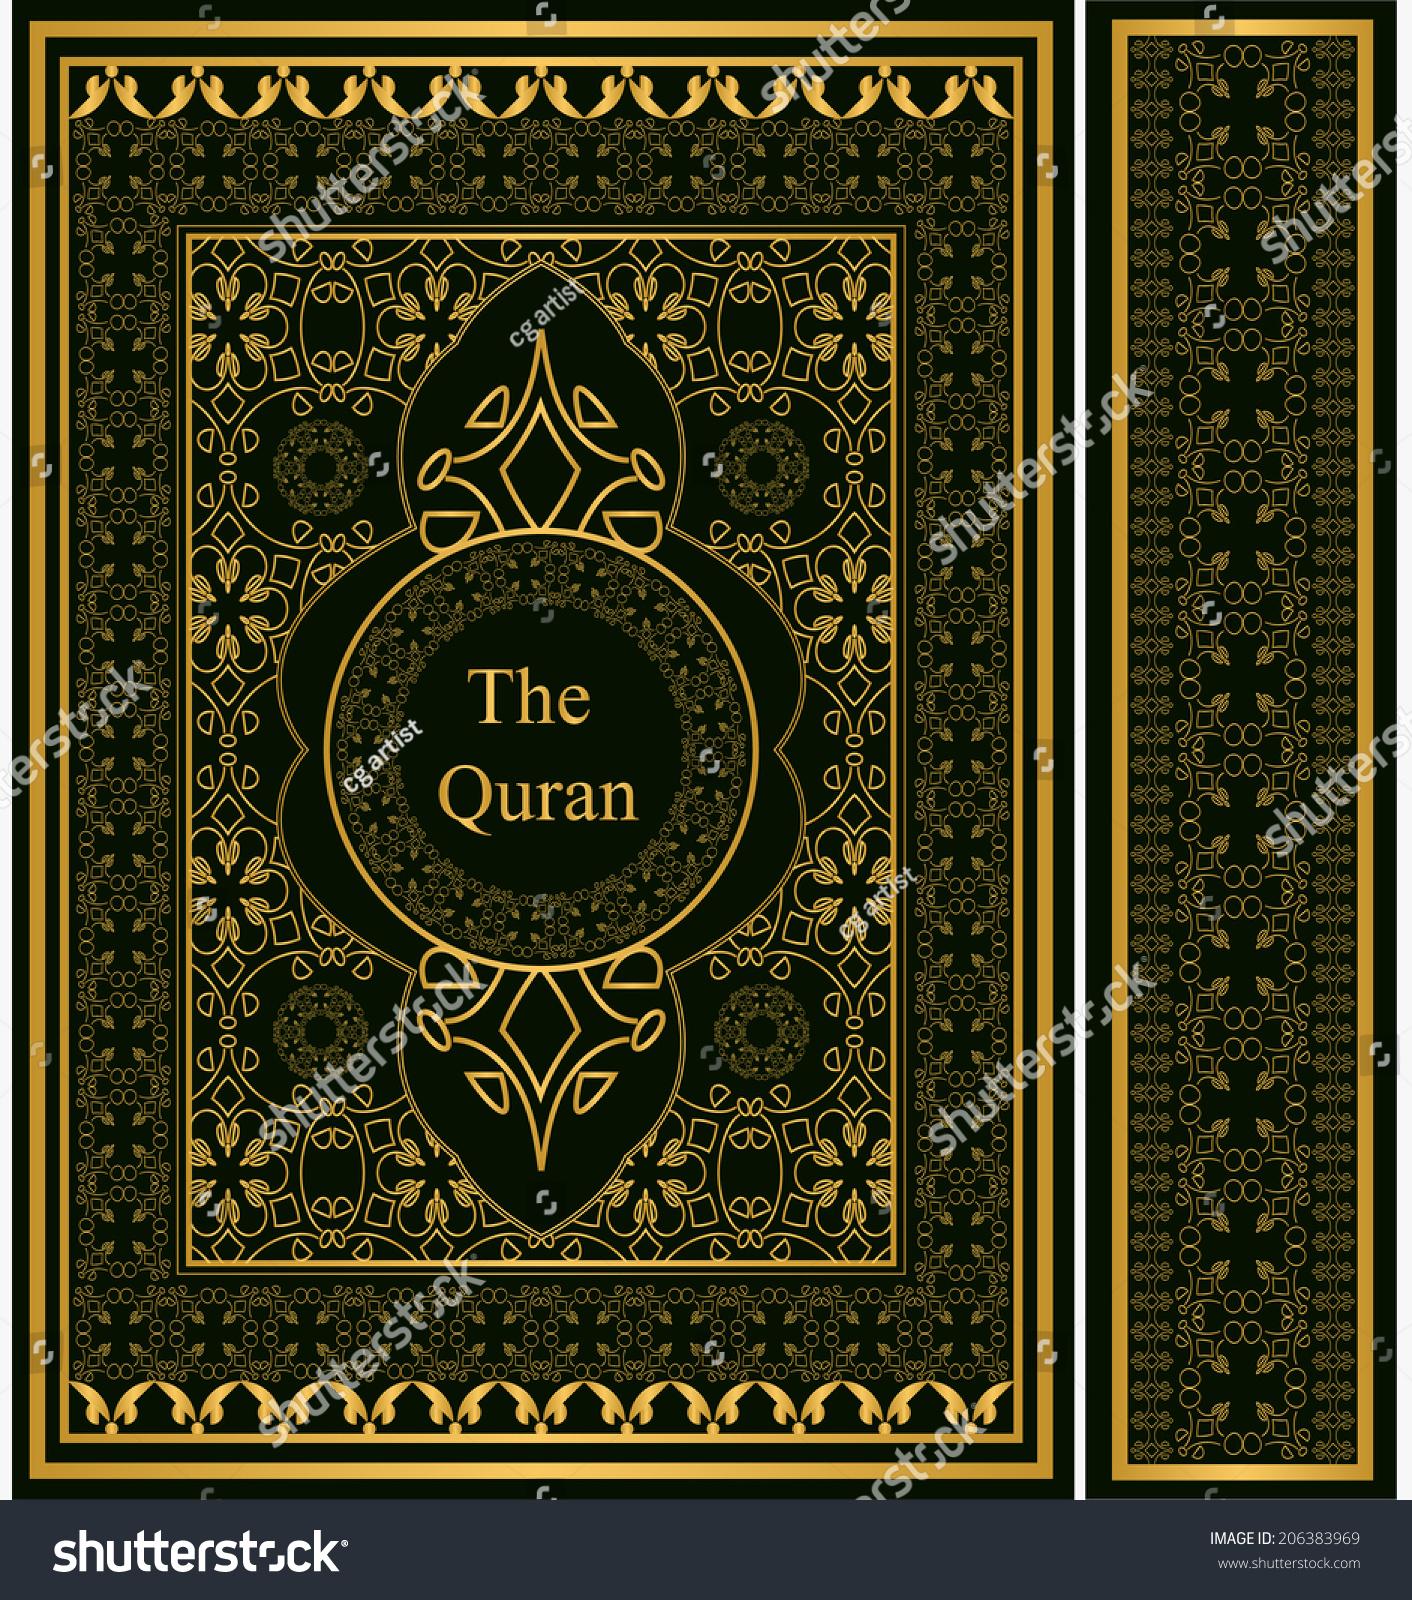 Quran Book Cover Template : Quran cover stock vector shutterstock